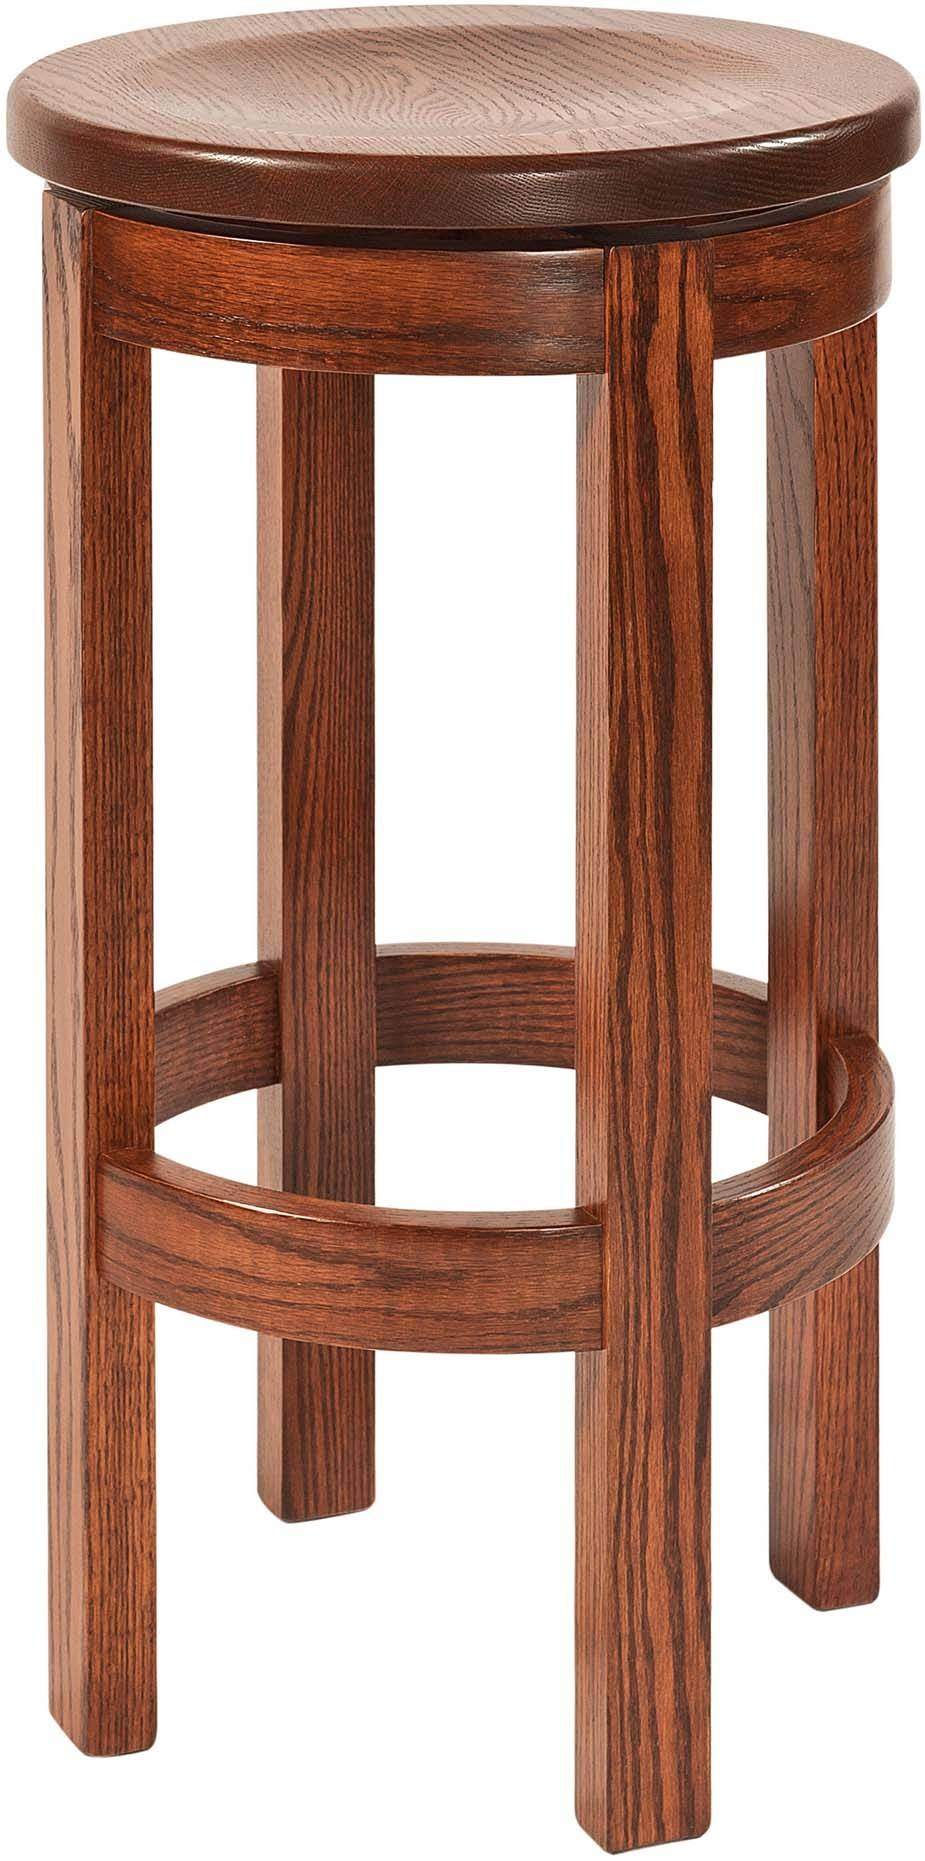 Barrel Barstool Without Back